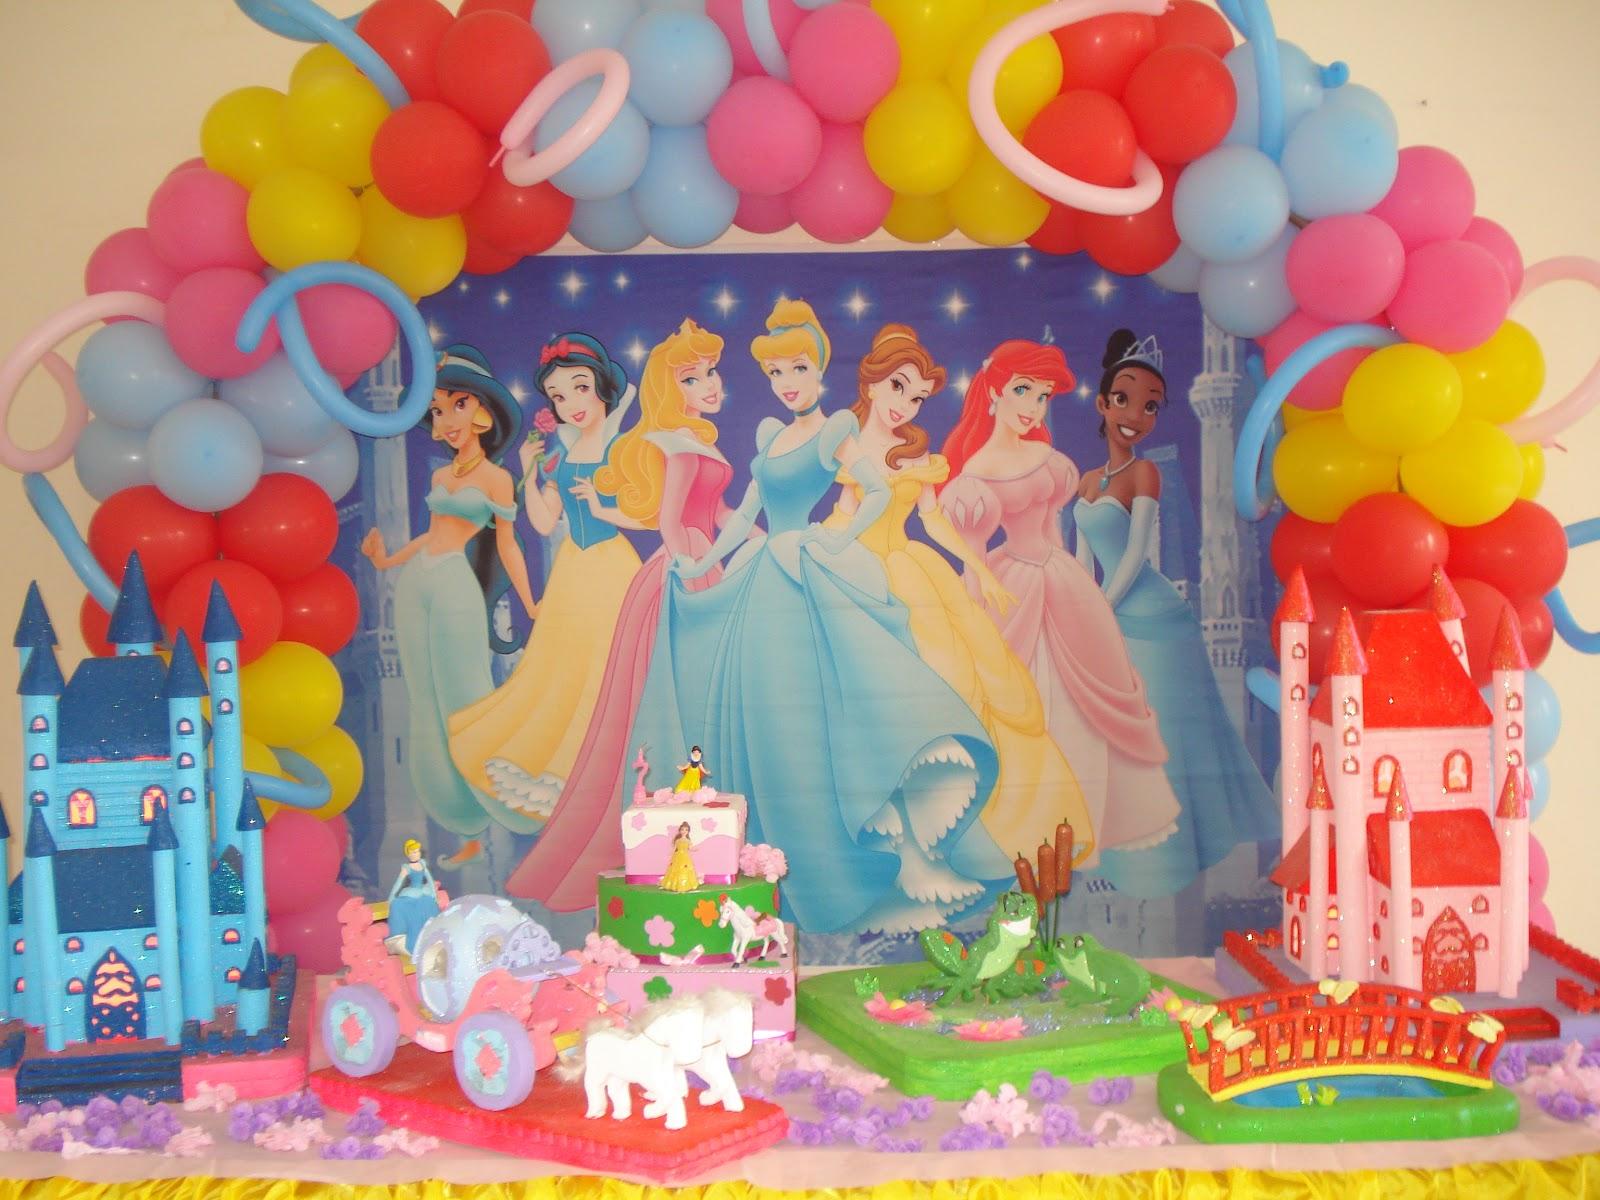 festa aniversario infantil jardim zoologico:Pin Mesa Decorada Festa Infantil Do Zoológico Ideias E Dicas on